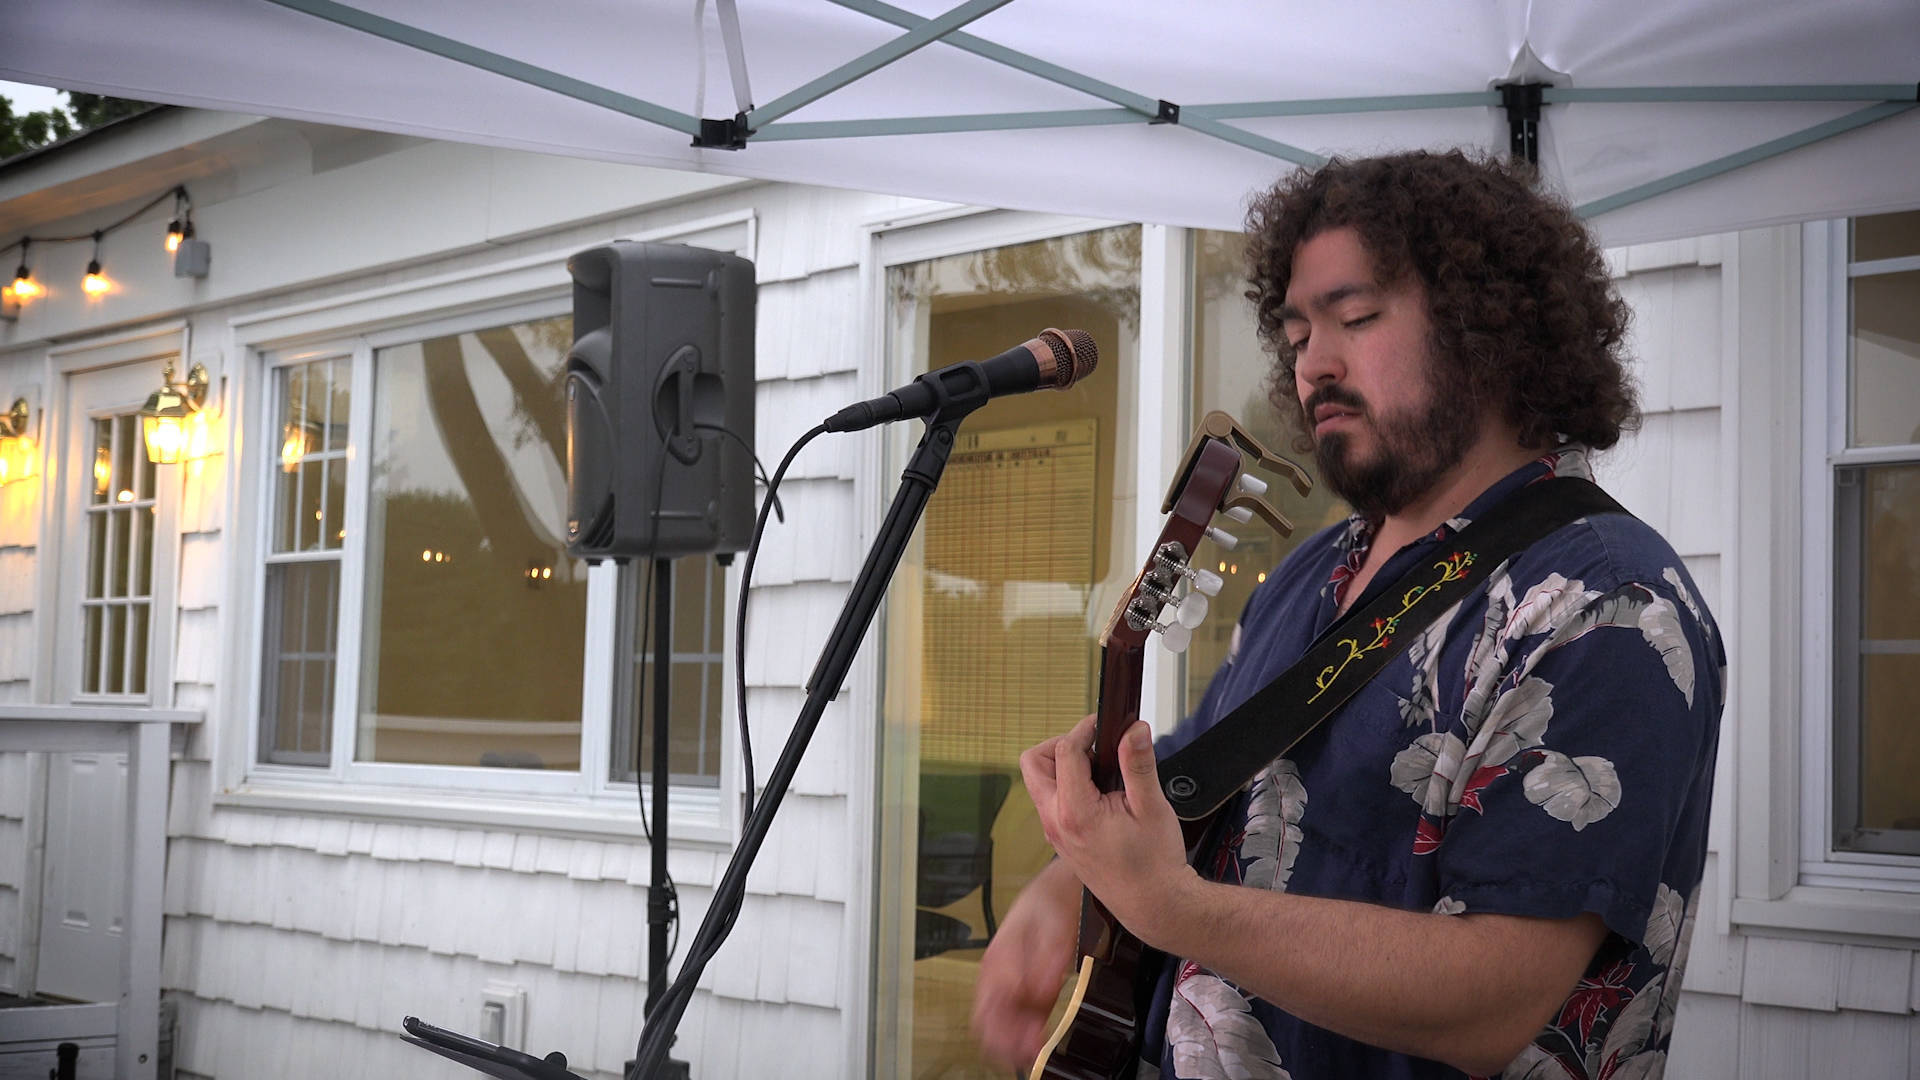 Professional Musician John-Pierre Conques